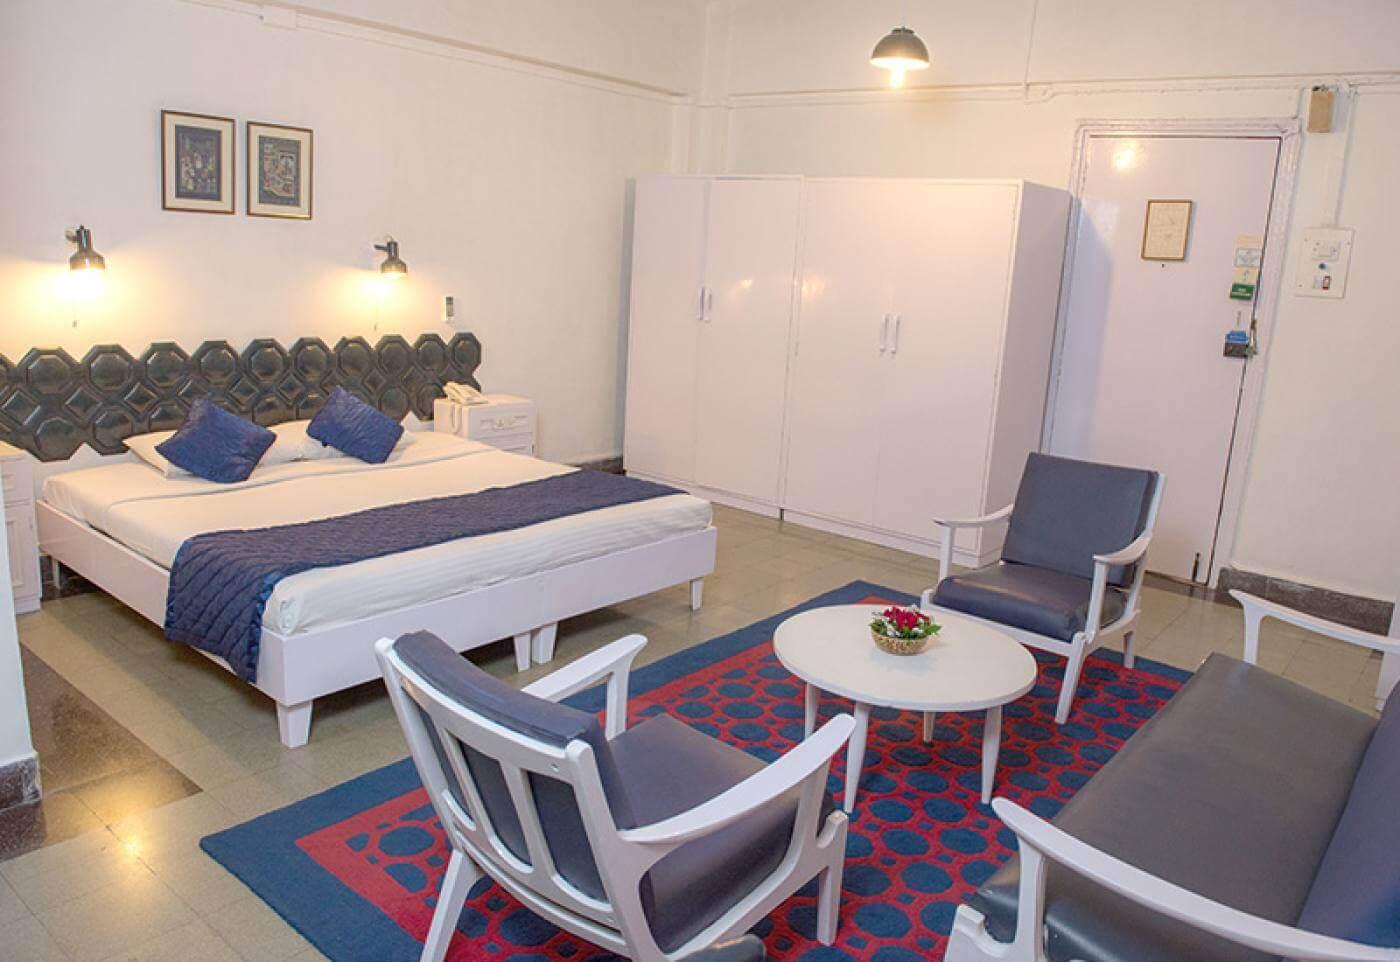 West End Hotel Room, Mumbai